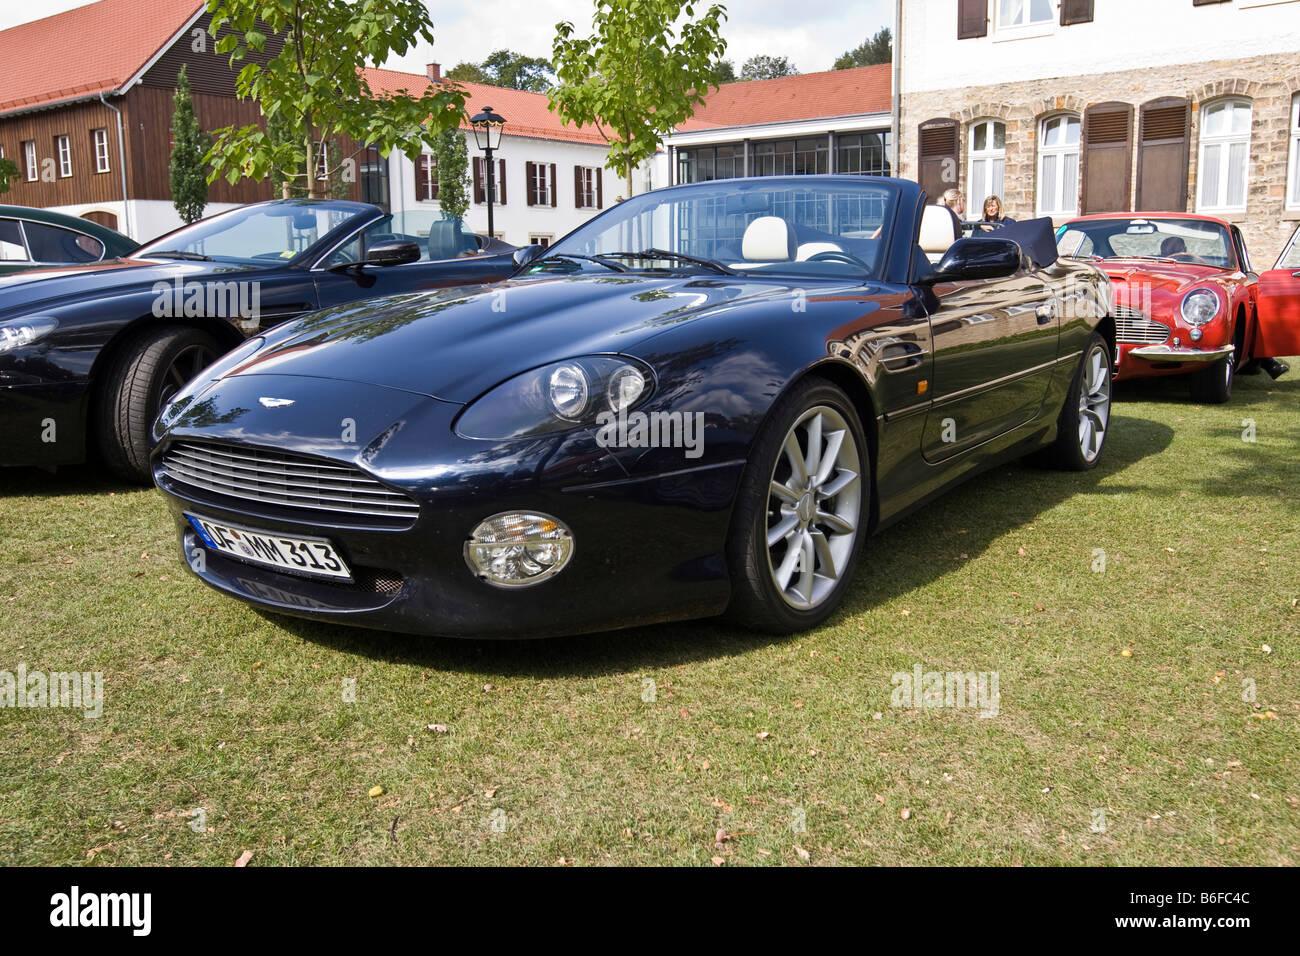 Aston Martin DB7 Vantage Volante 12 cylinder, Aston Martin Meet, Lower Saxony, Germany, Europe - Stock Image